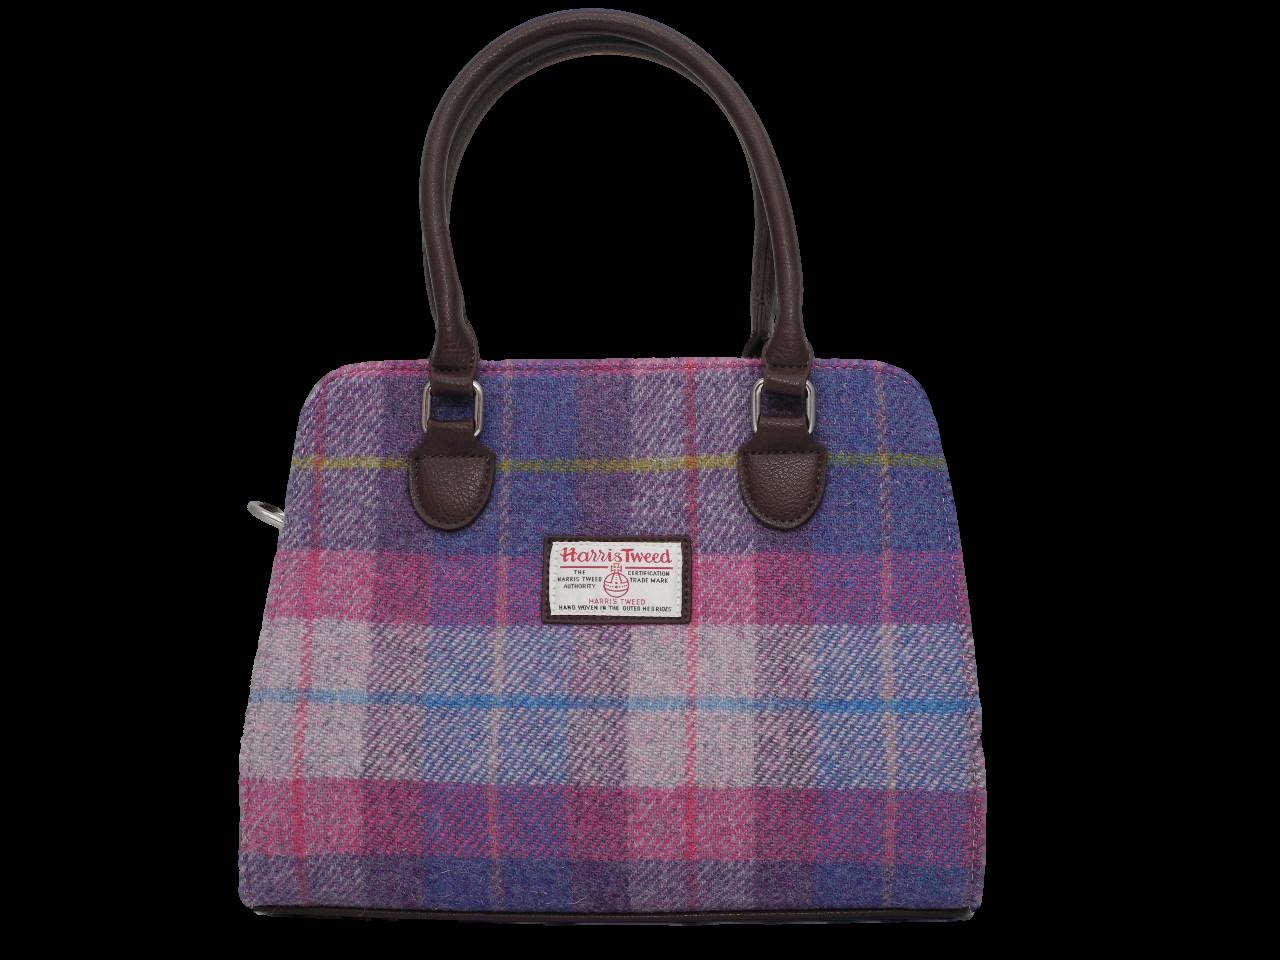 scottish ladies gift harris tweed handbag shoulder bag burgundy cerise blue check